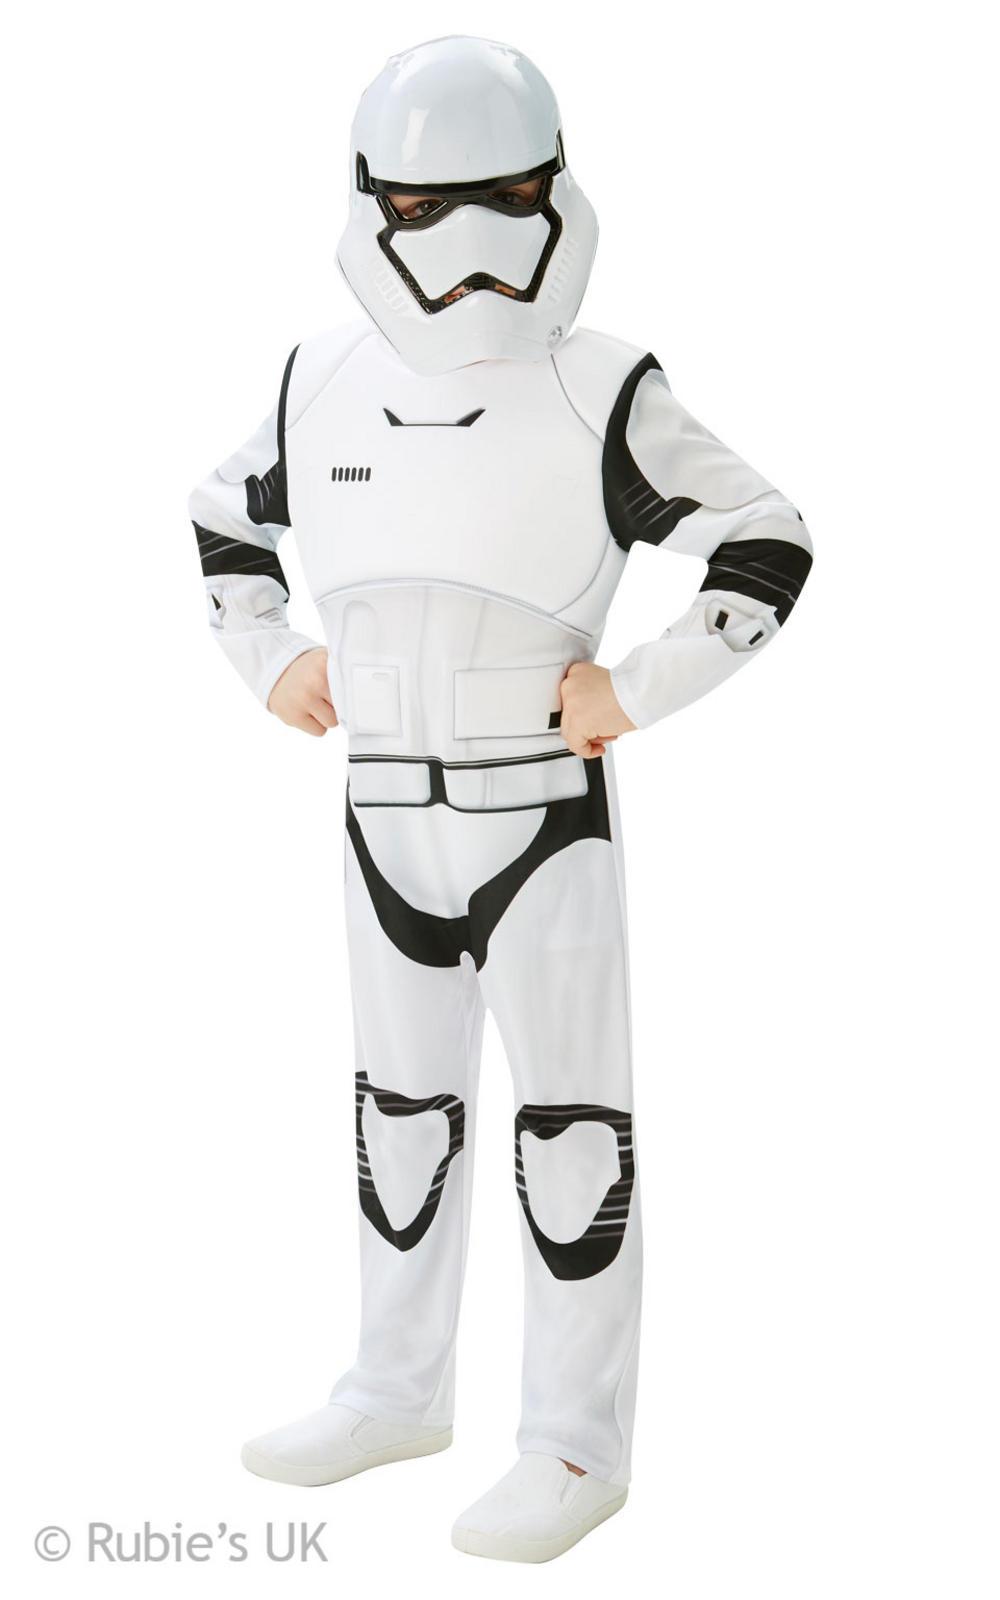 Deluxe Stormtrooper Boys The Force Awakens Star Wars Costume